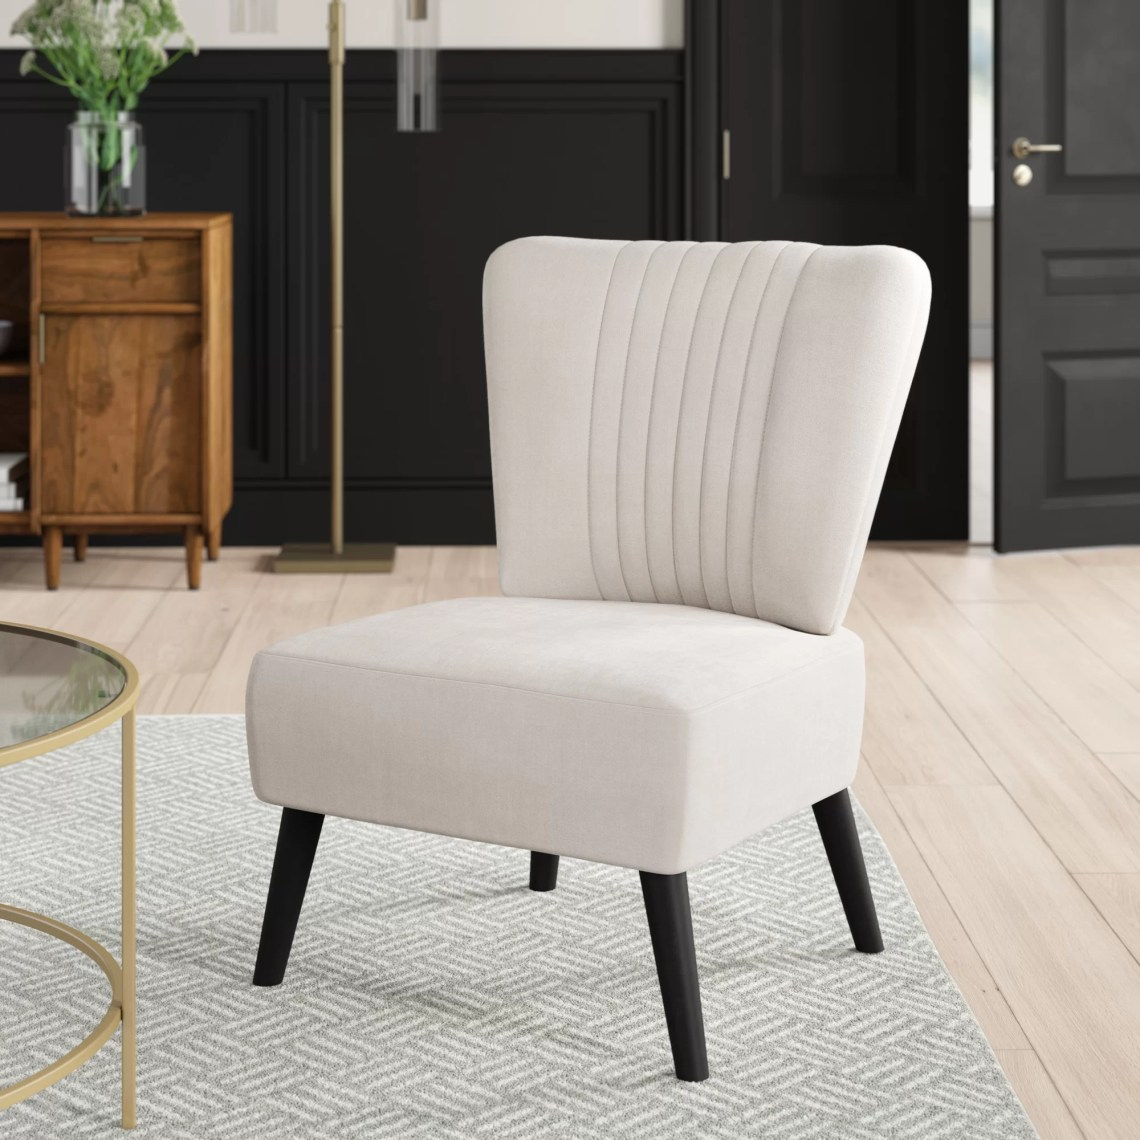 Modern Accent Chairs Living Room Sale Under $100 | AllModern